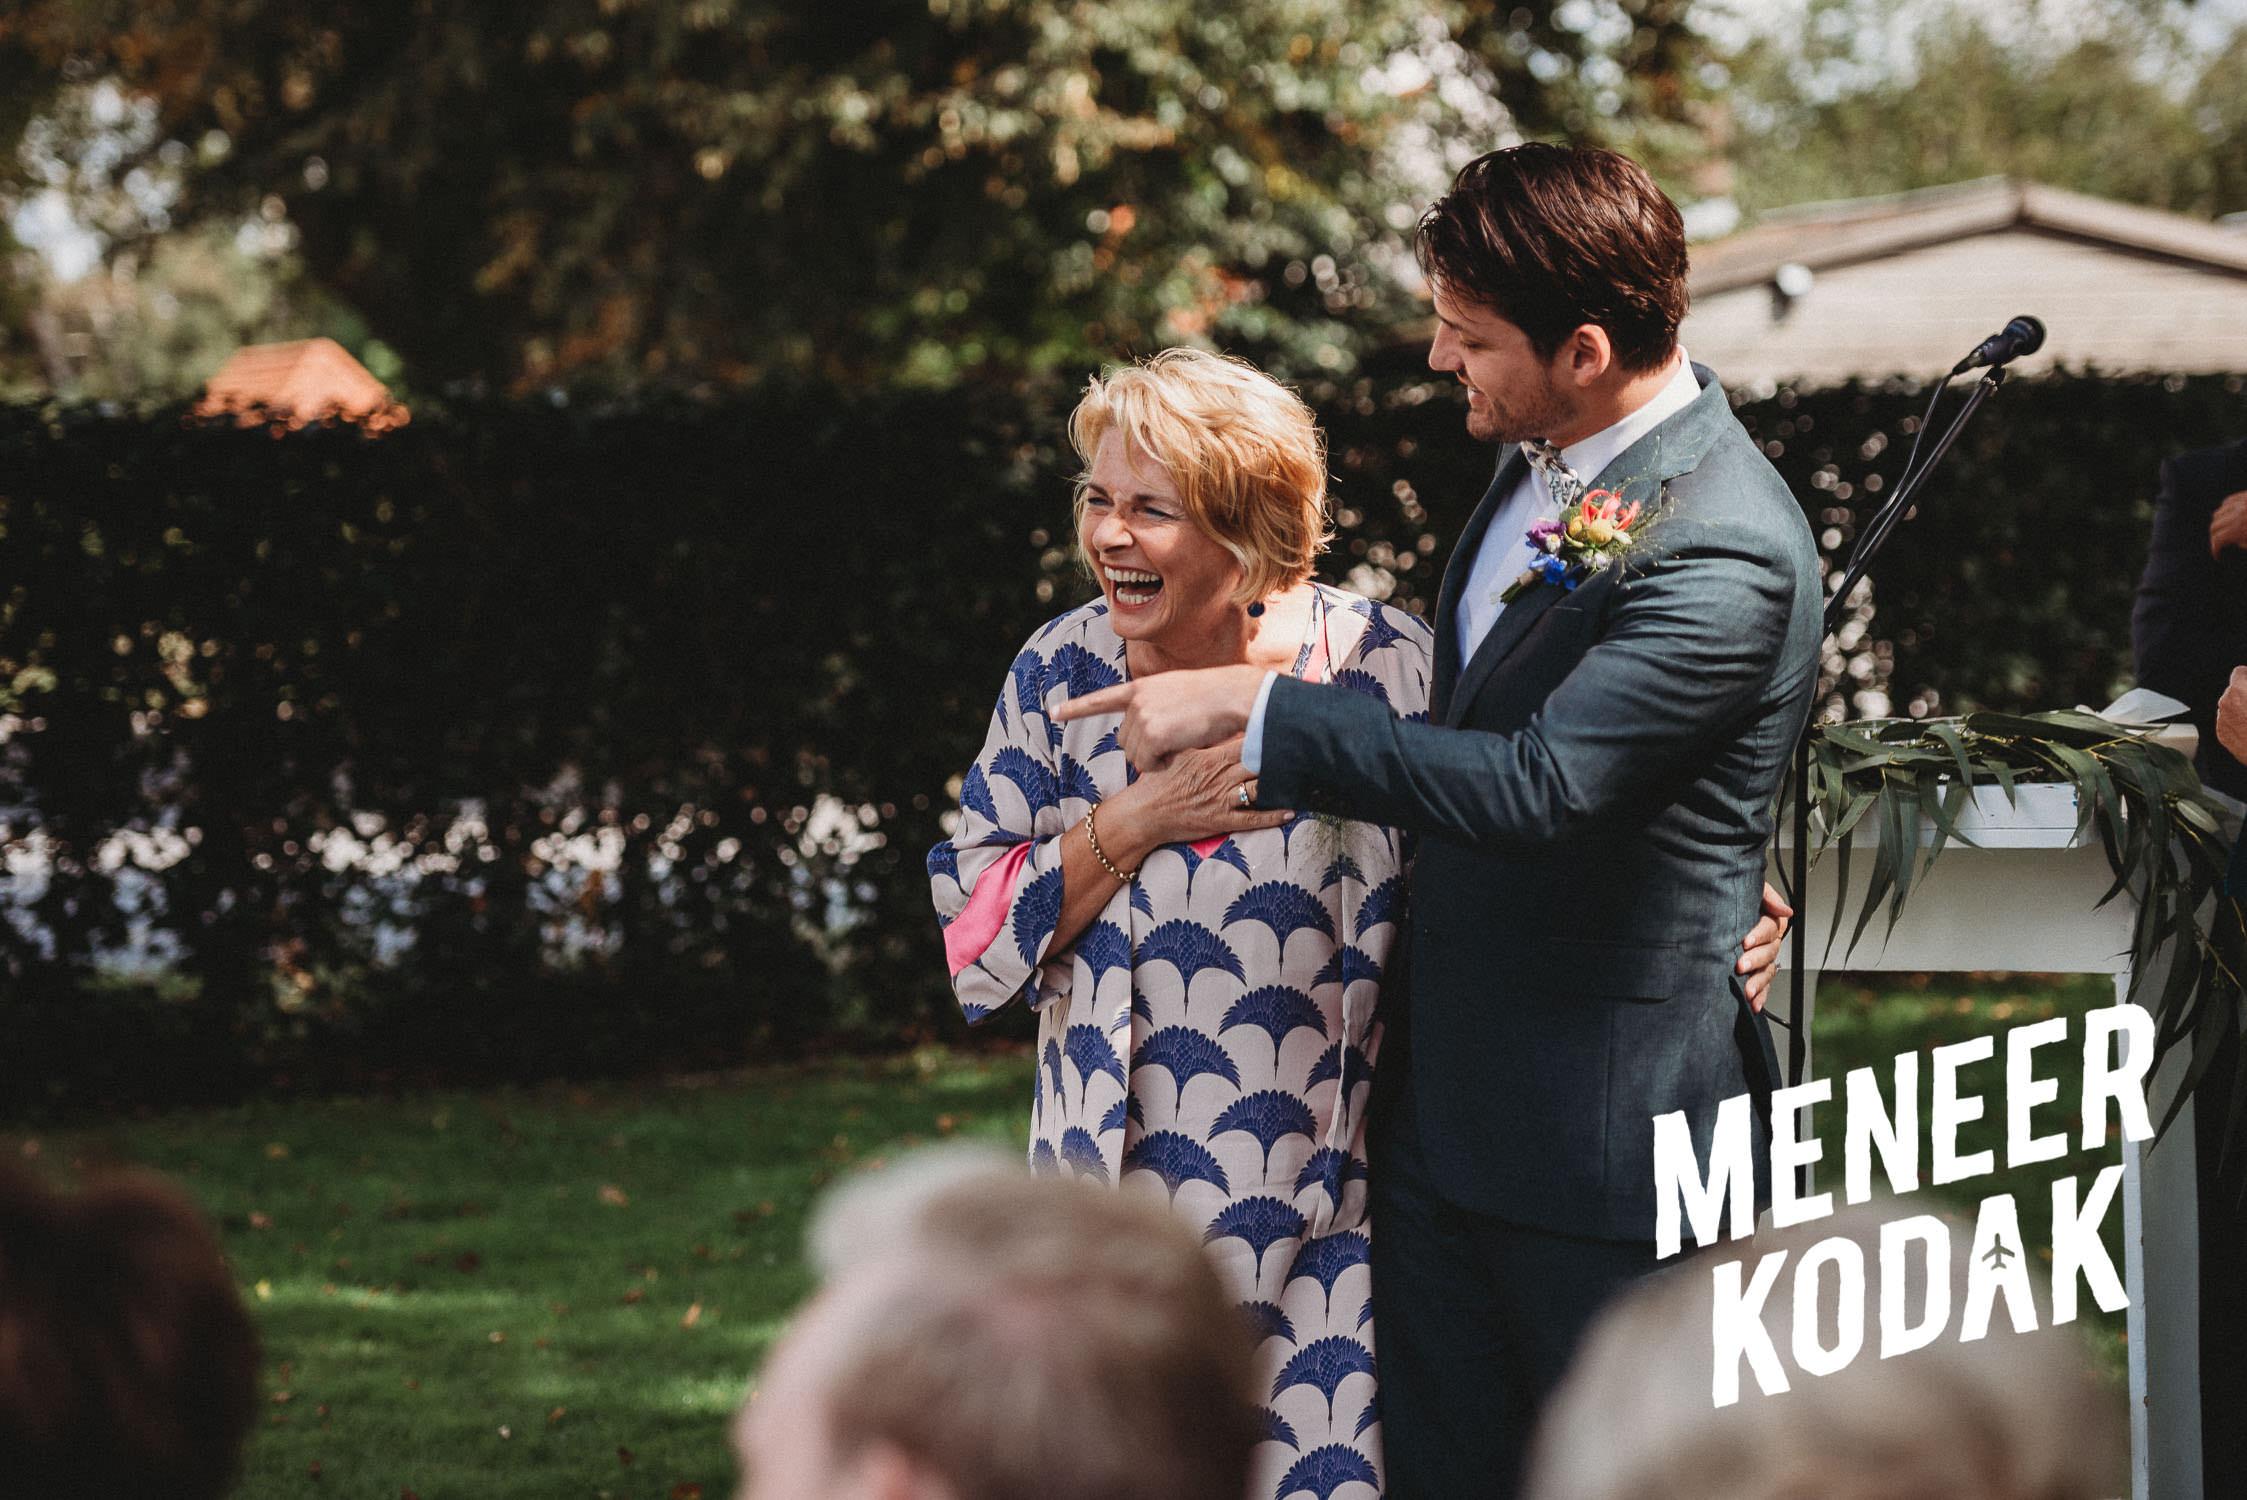 Meneer Kodak - Trouwreportage - Breda - E&M-090.jpg